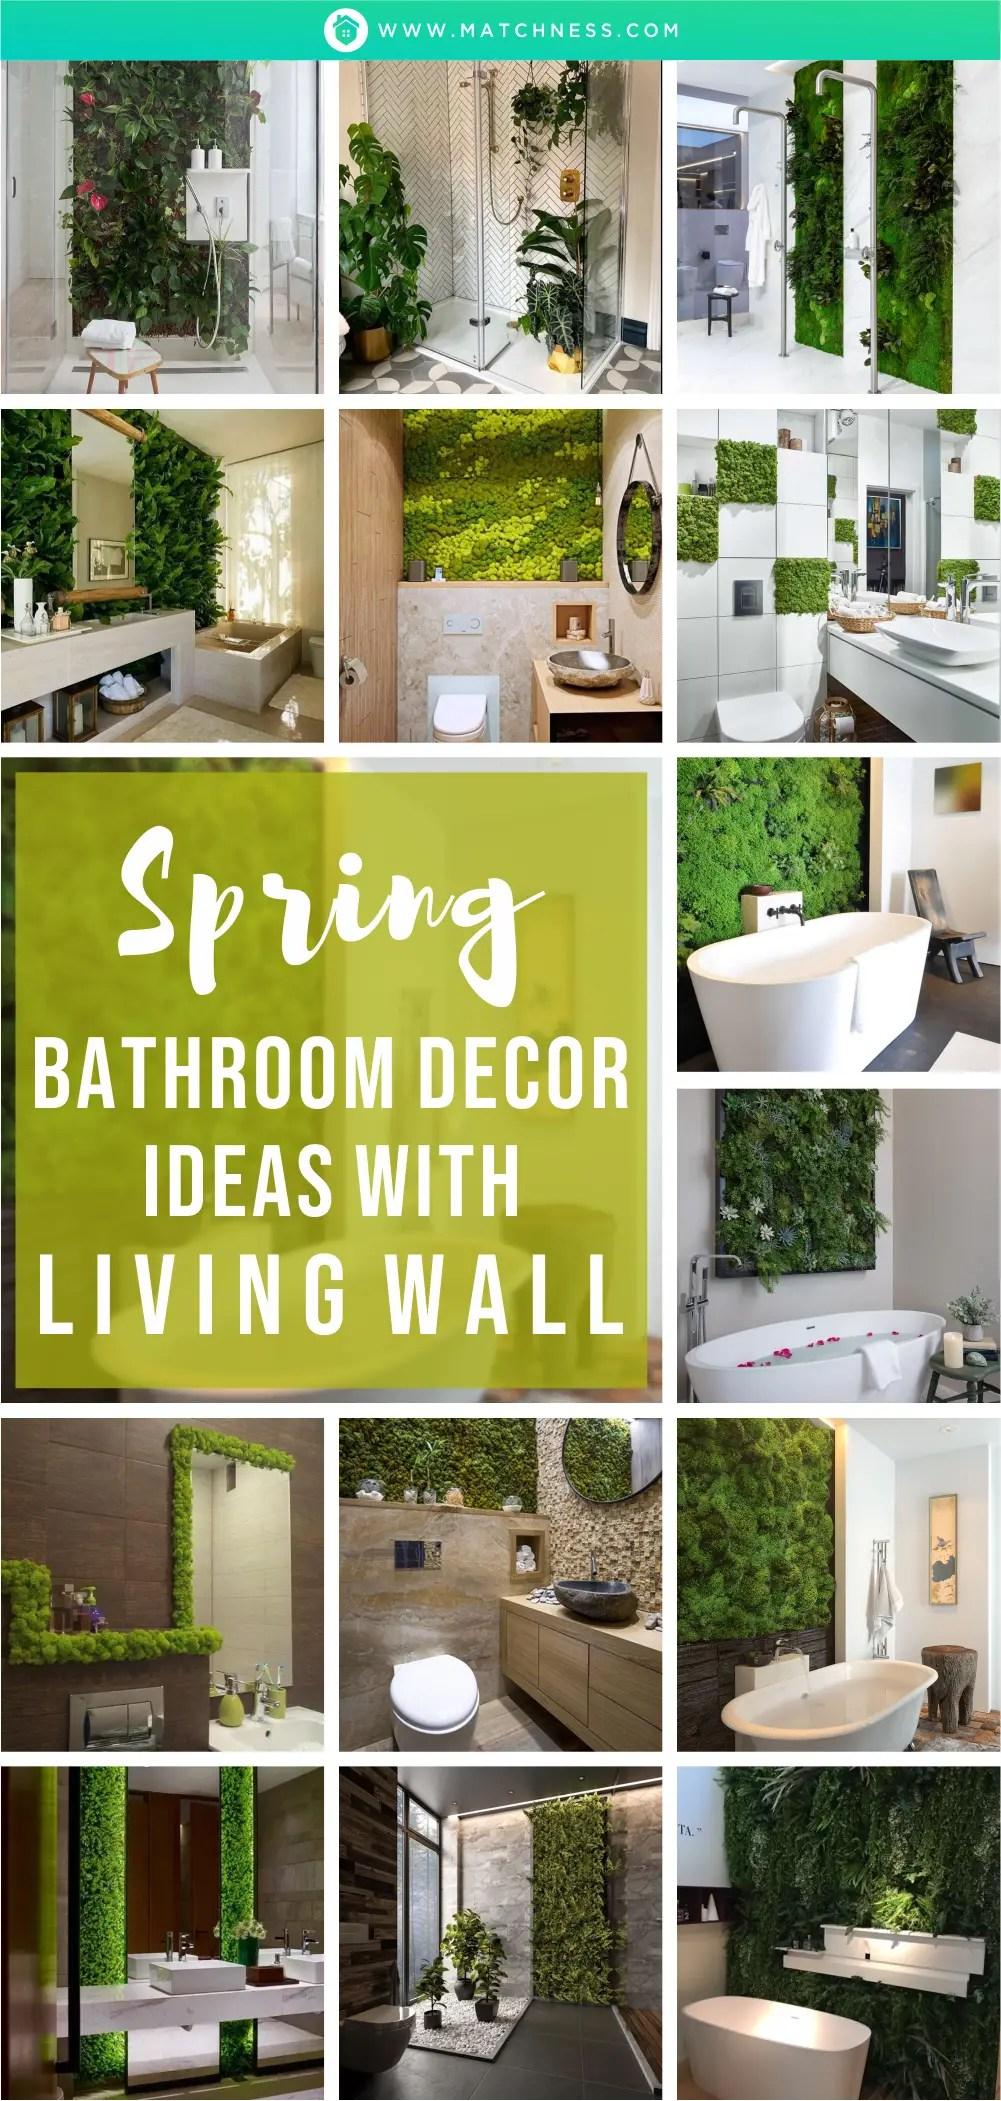 Spring-bathroom-decor-ideas-with-living-wall-01